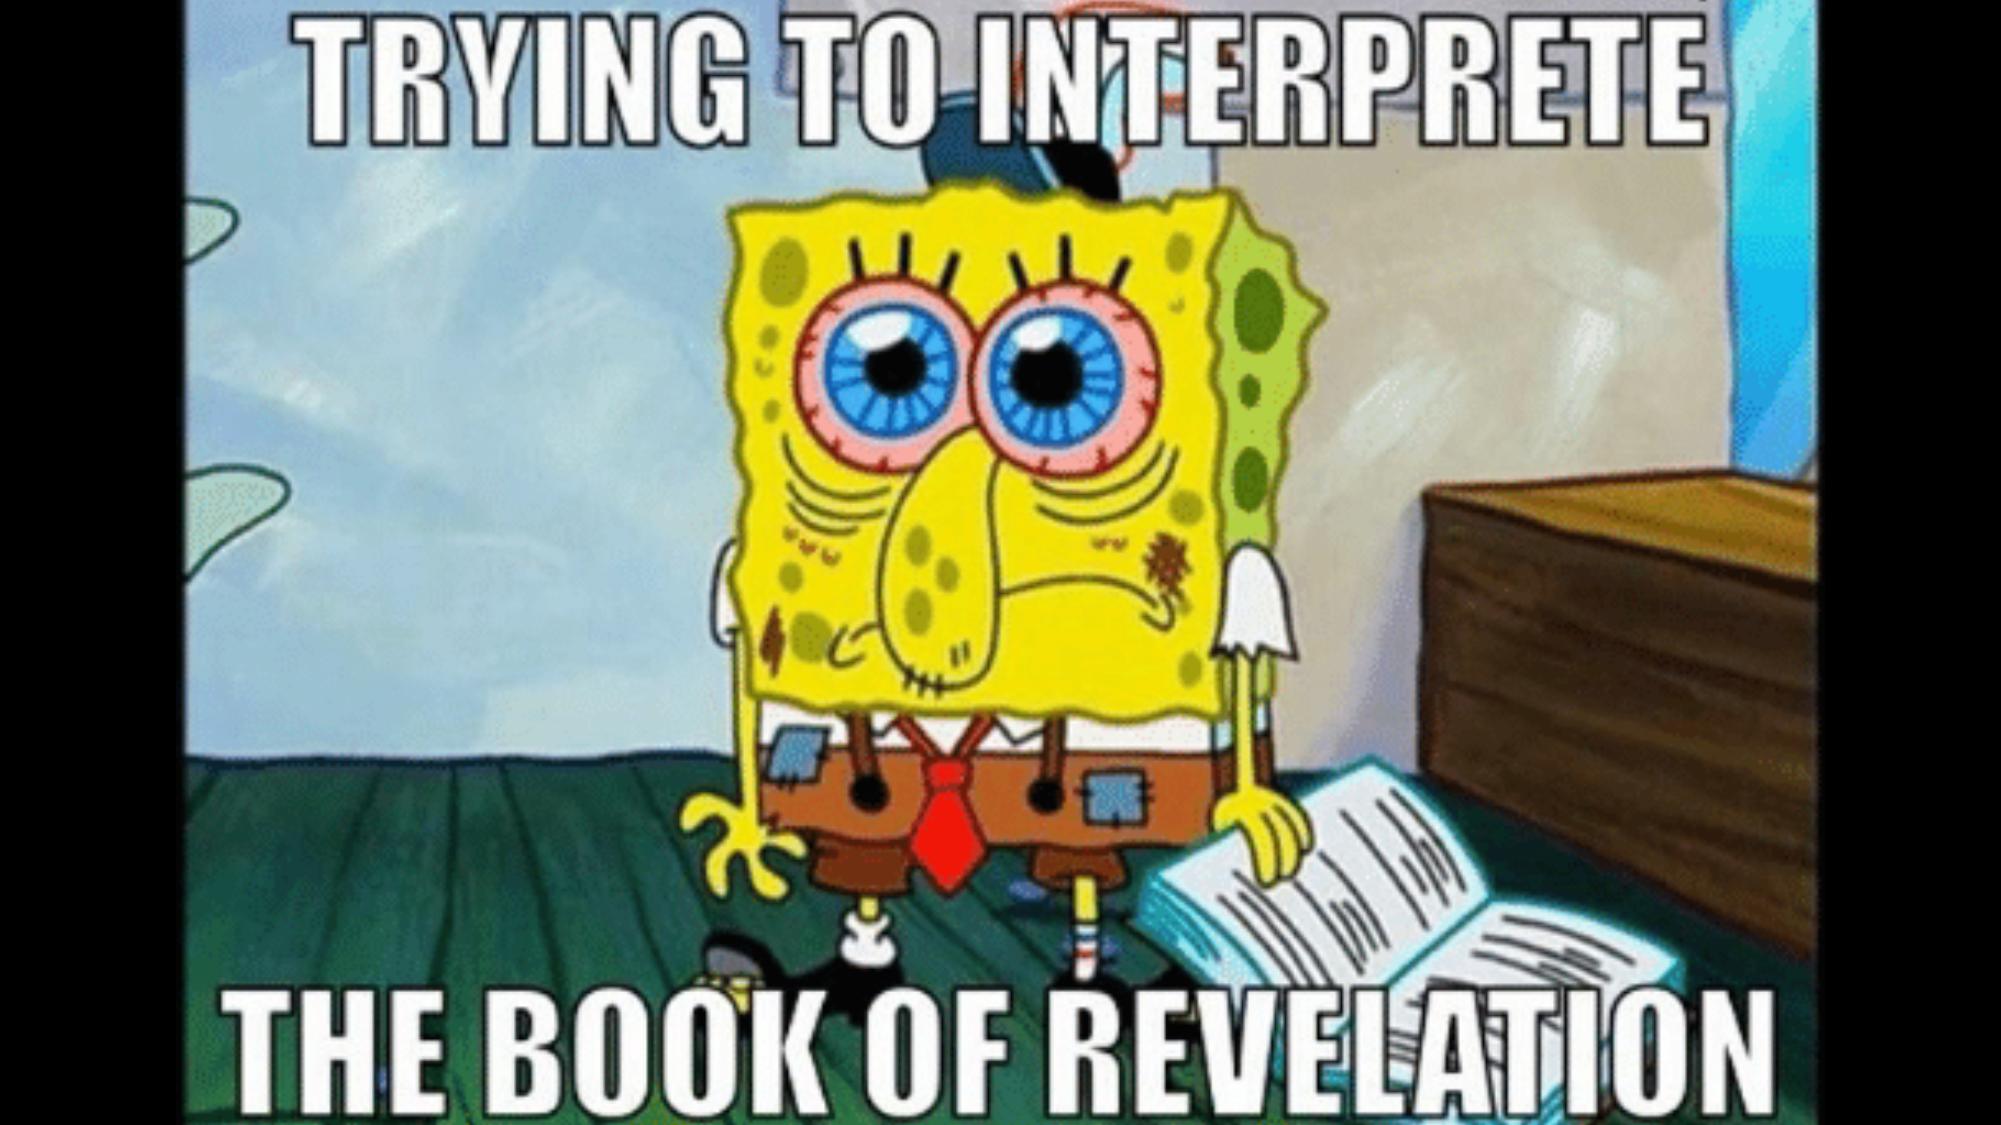 revelation Spongebob.png